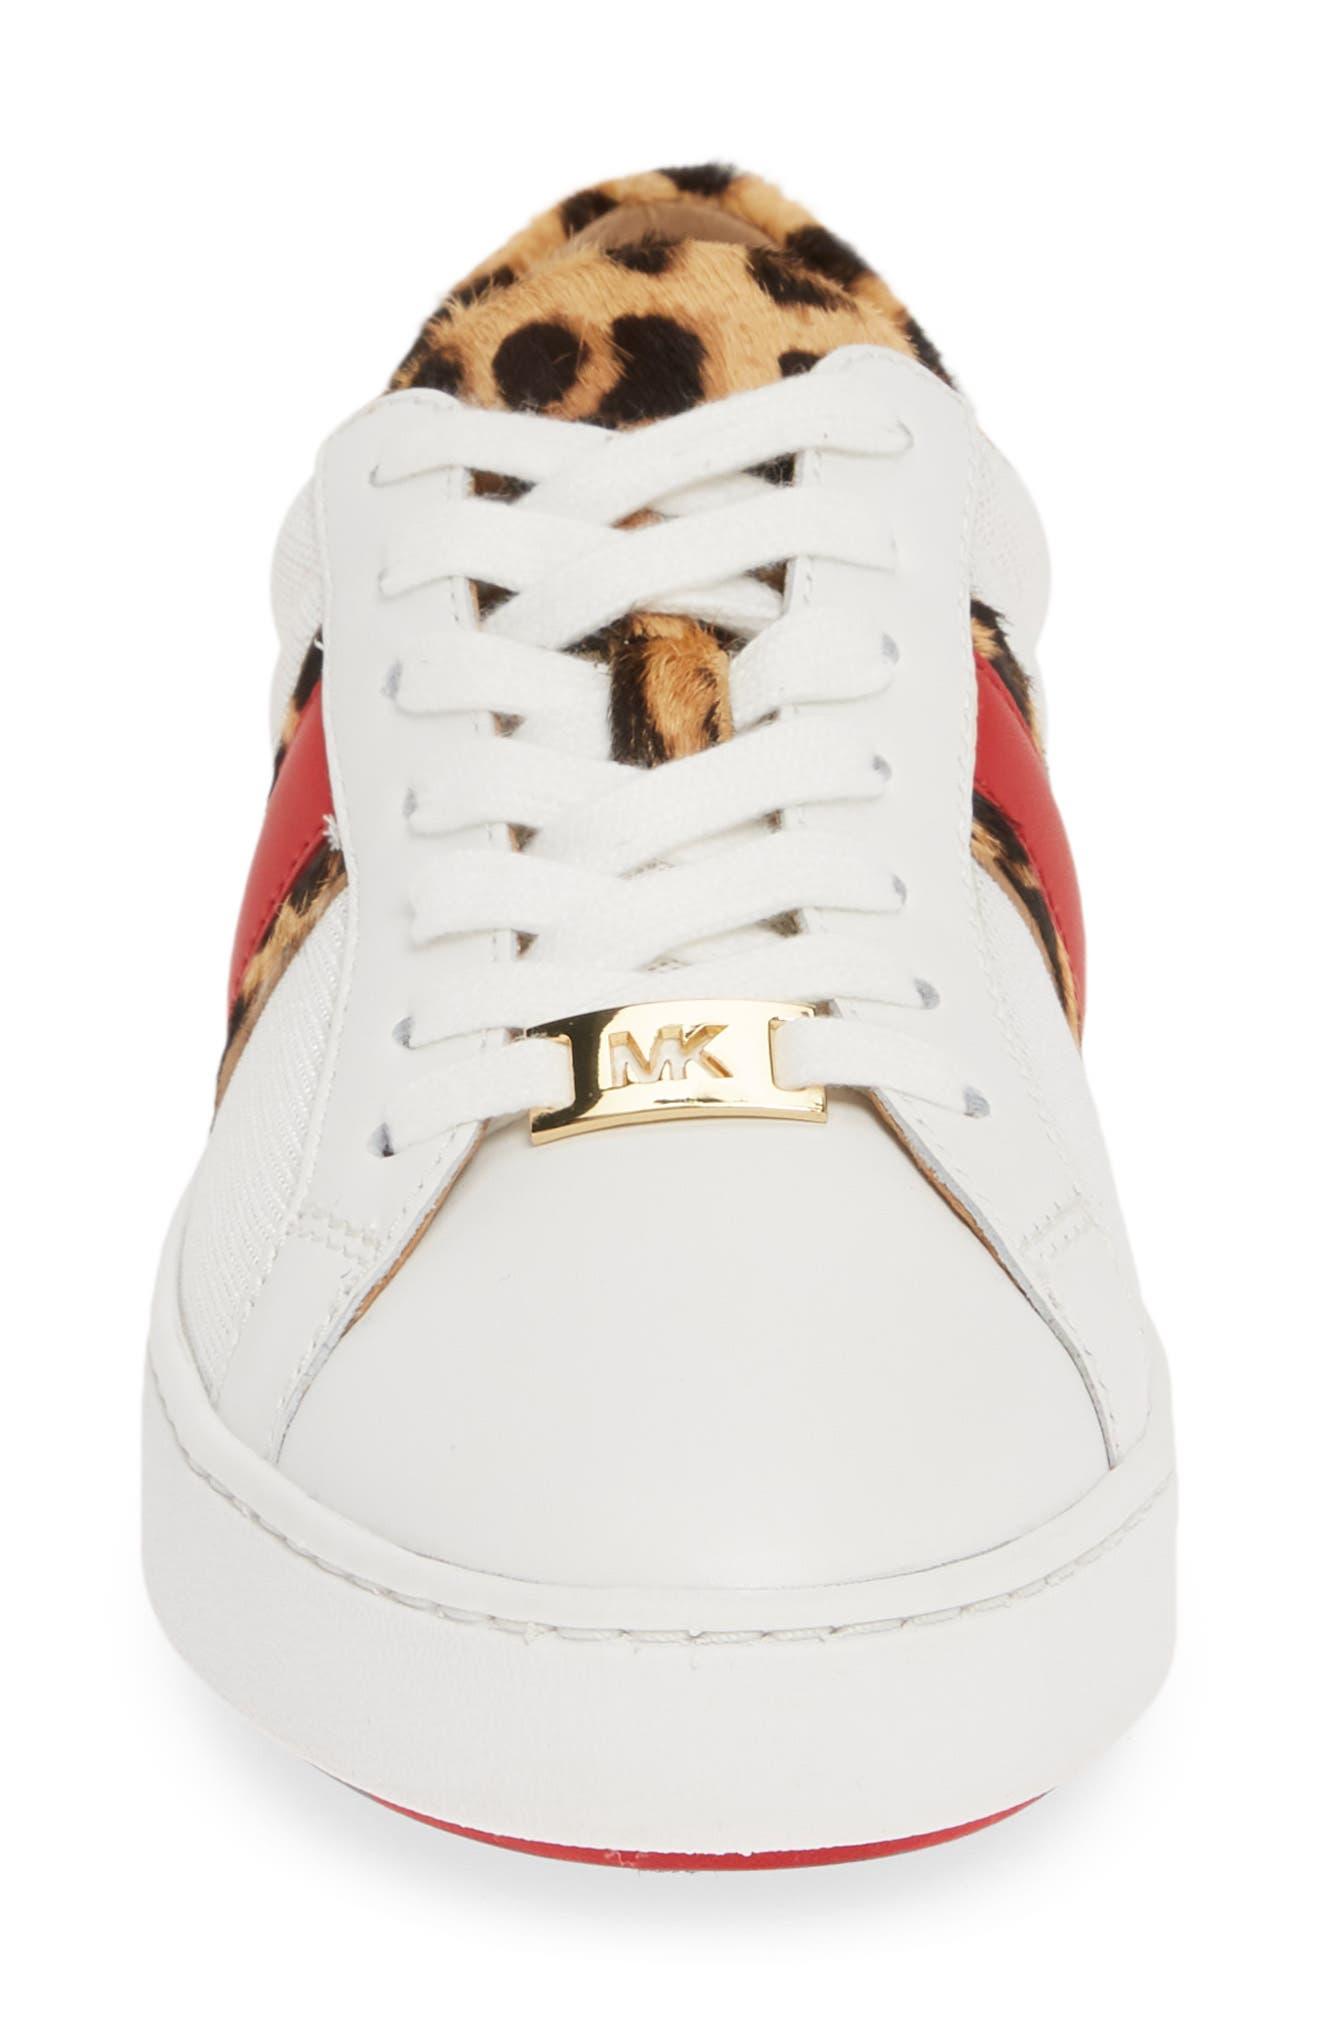 MICHAEL MICHAEL KORS, Irving Stripe Sneaker, Alternate thumbnail 4, color, OPTIC WHITE/ NATURAL